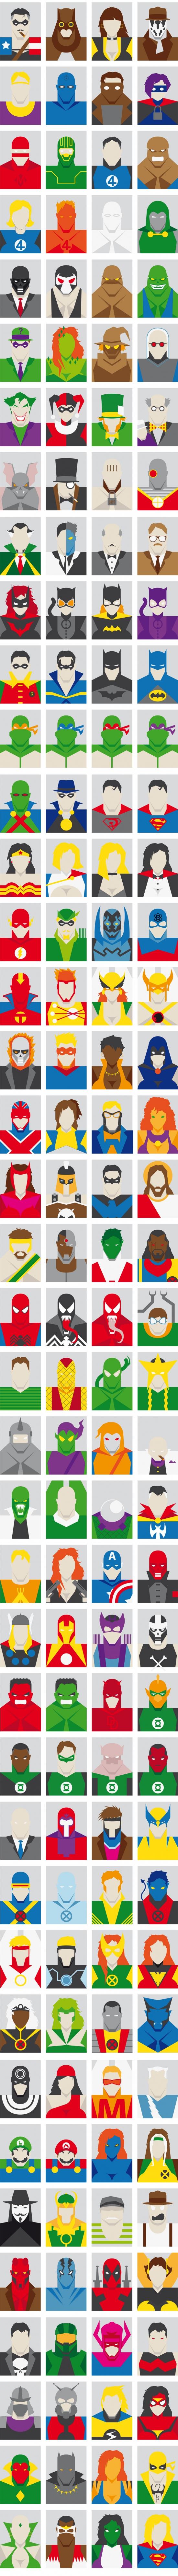 minimal faces.jpg